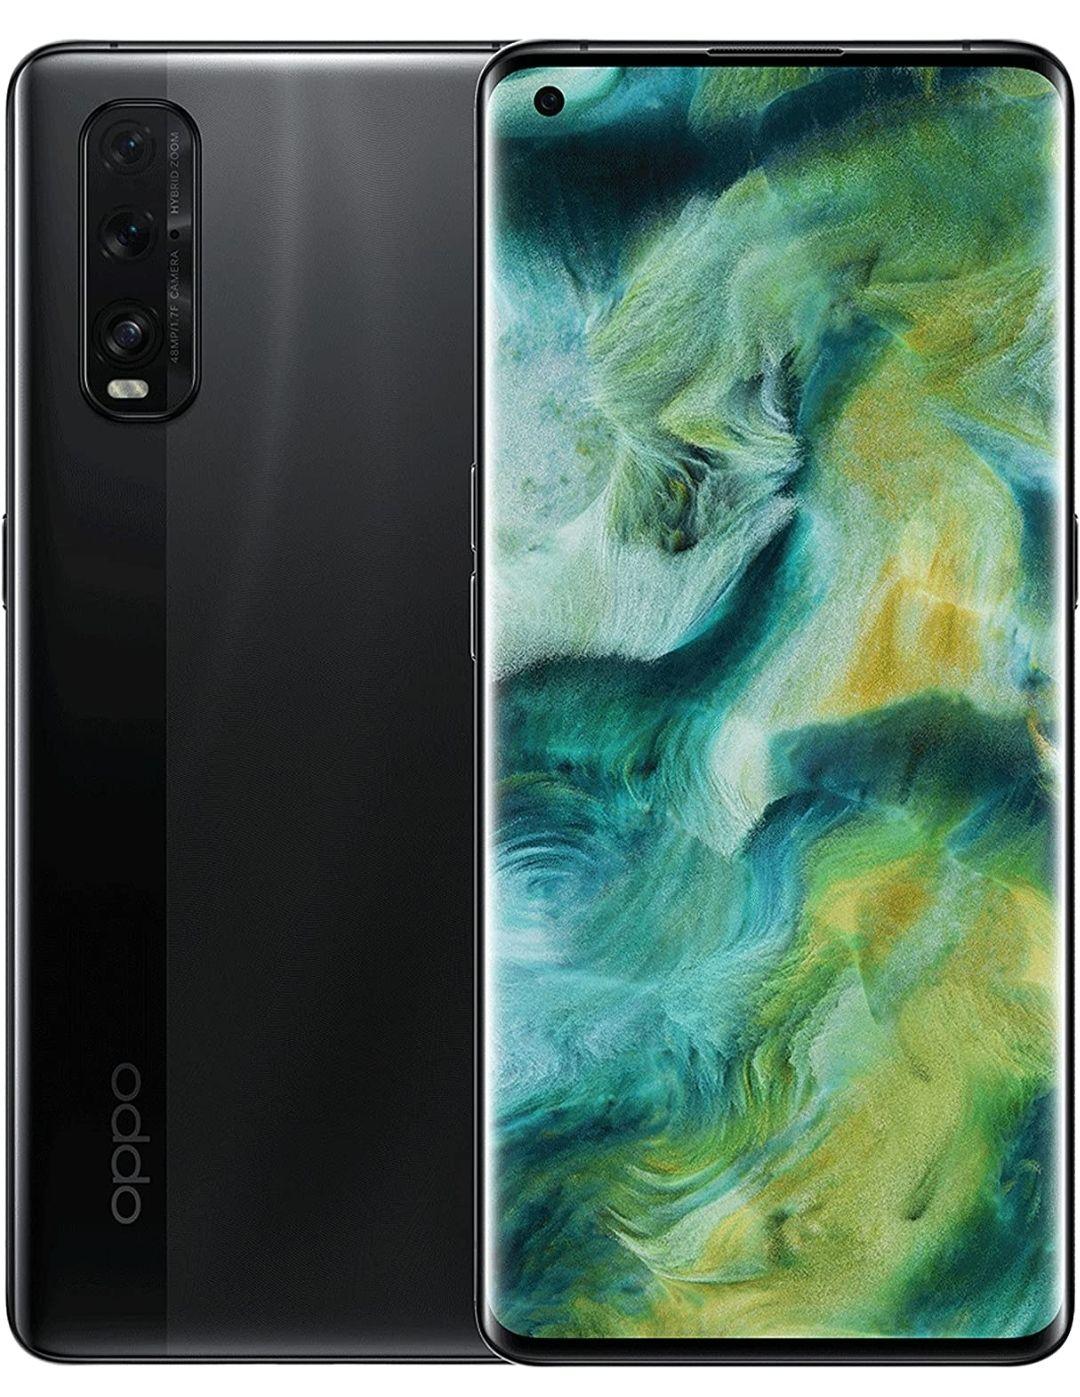 OPPO Find X2 5G Snapdragon 865 Smartphone - £509.10 @ Amazon